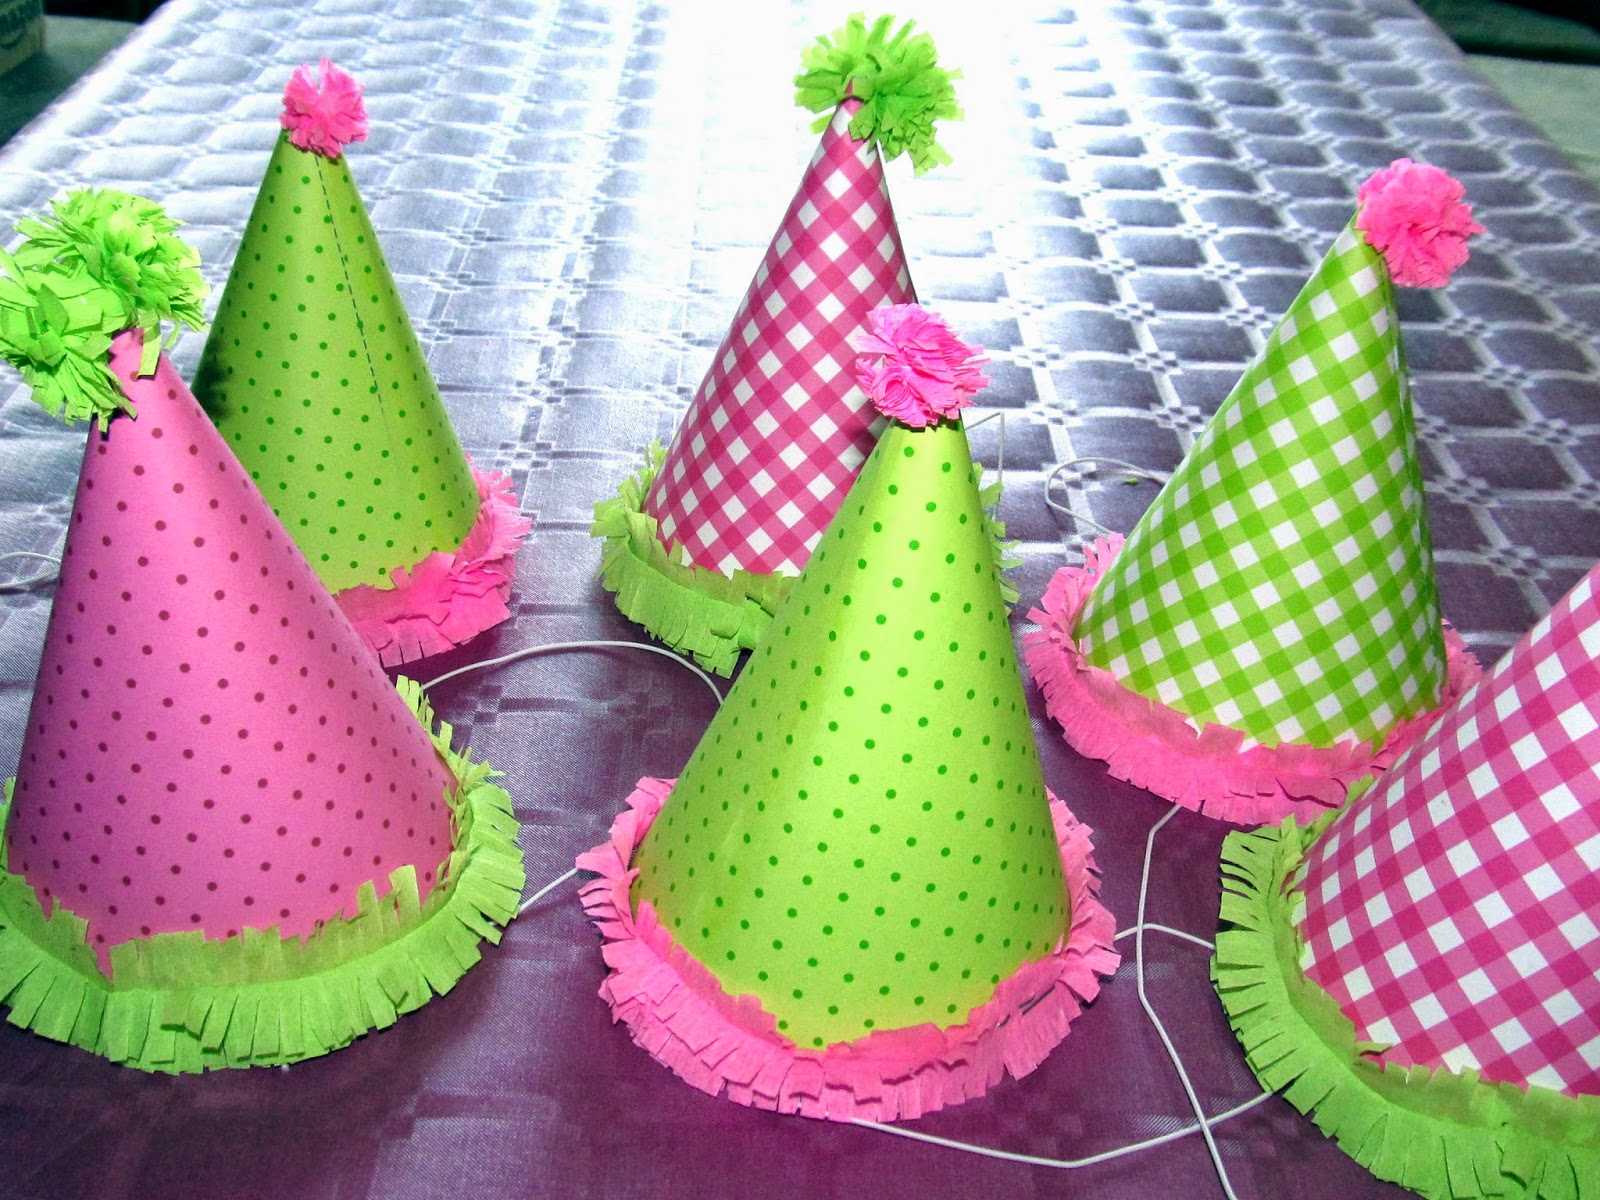 Fiestas infantiles DF Banquetes de fiestas infantiles